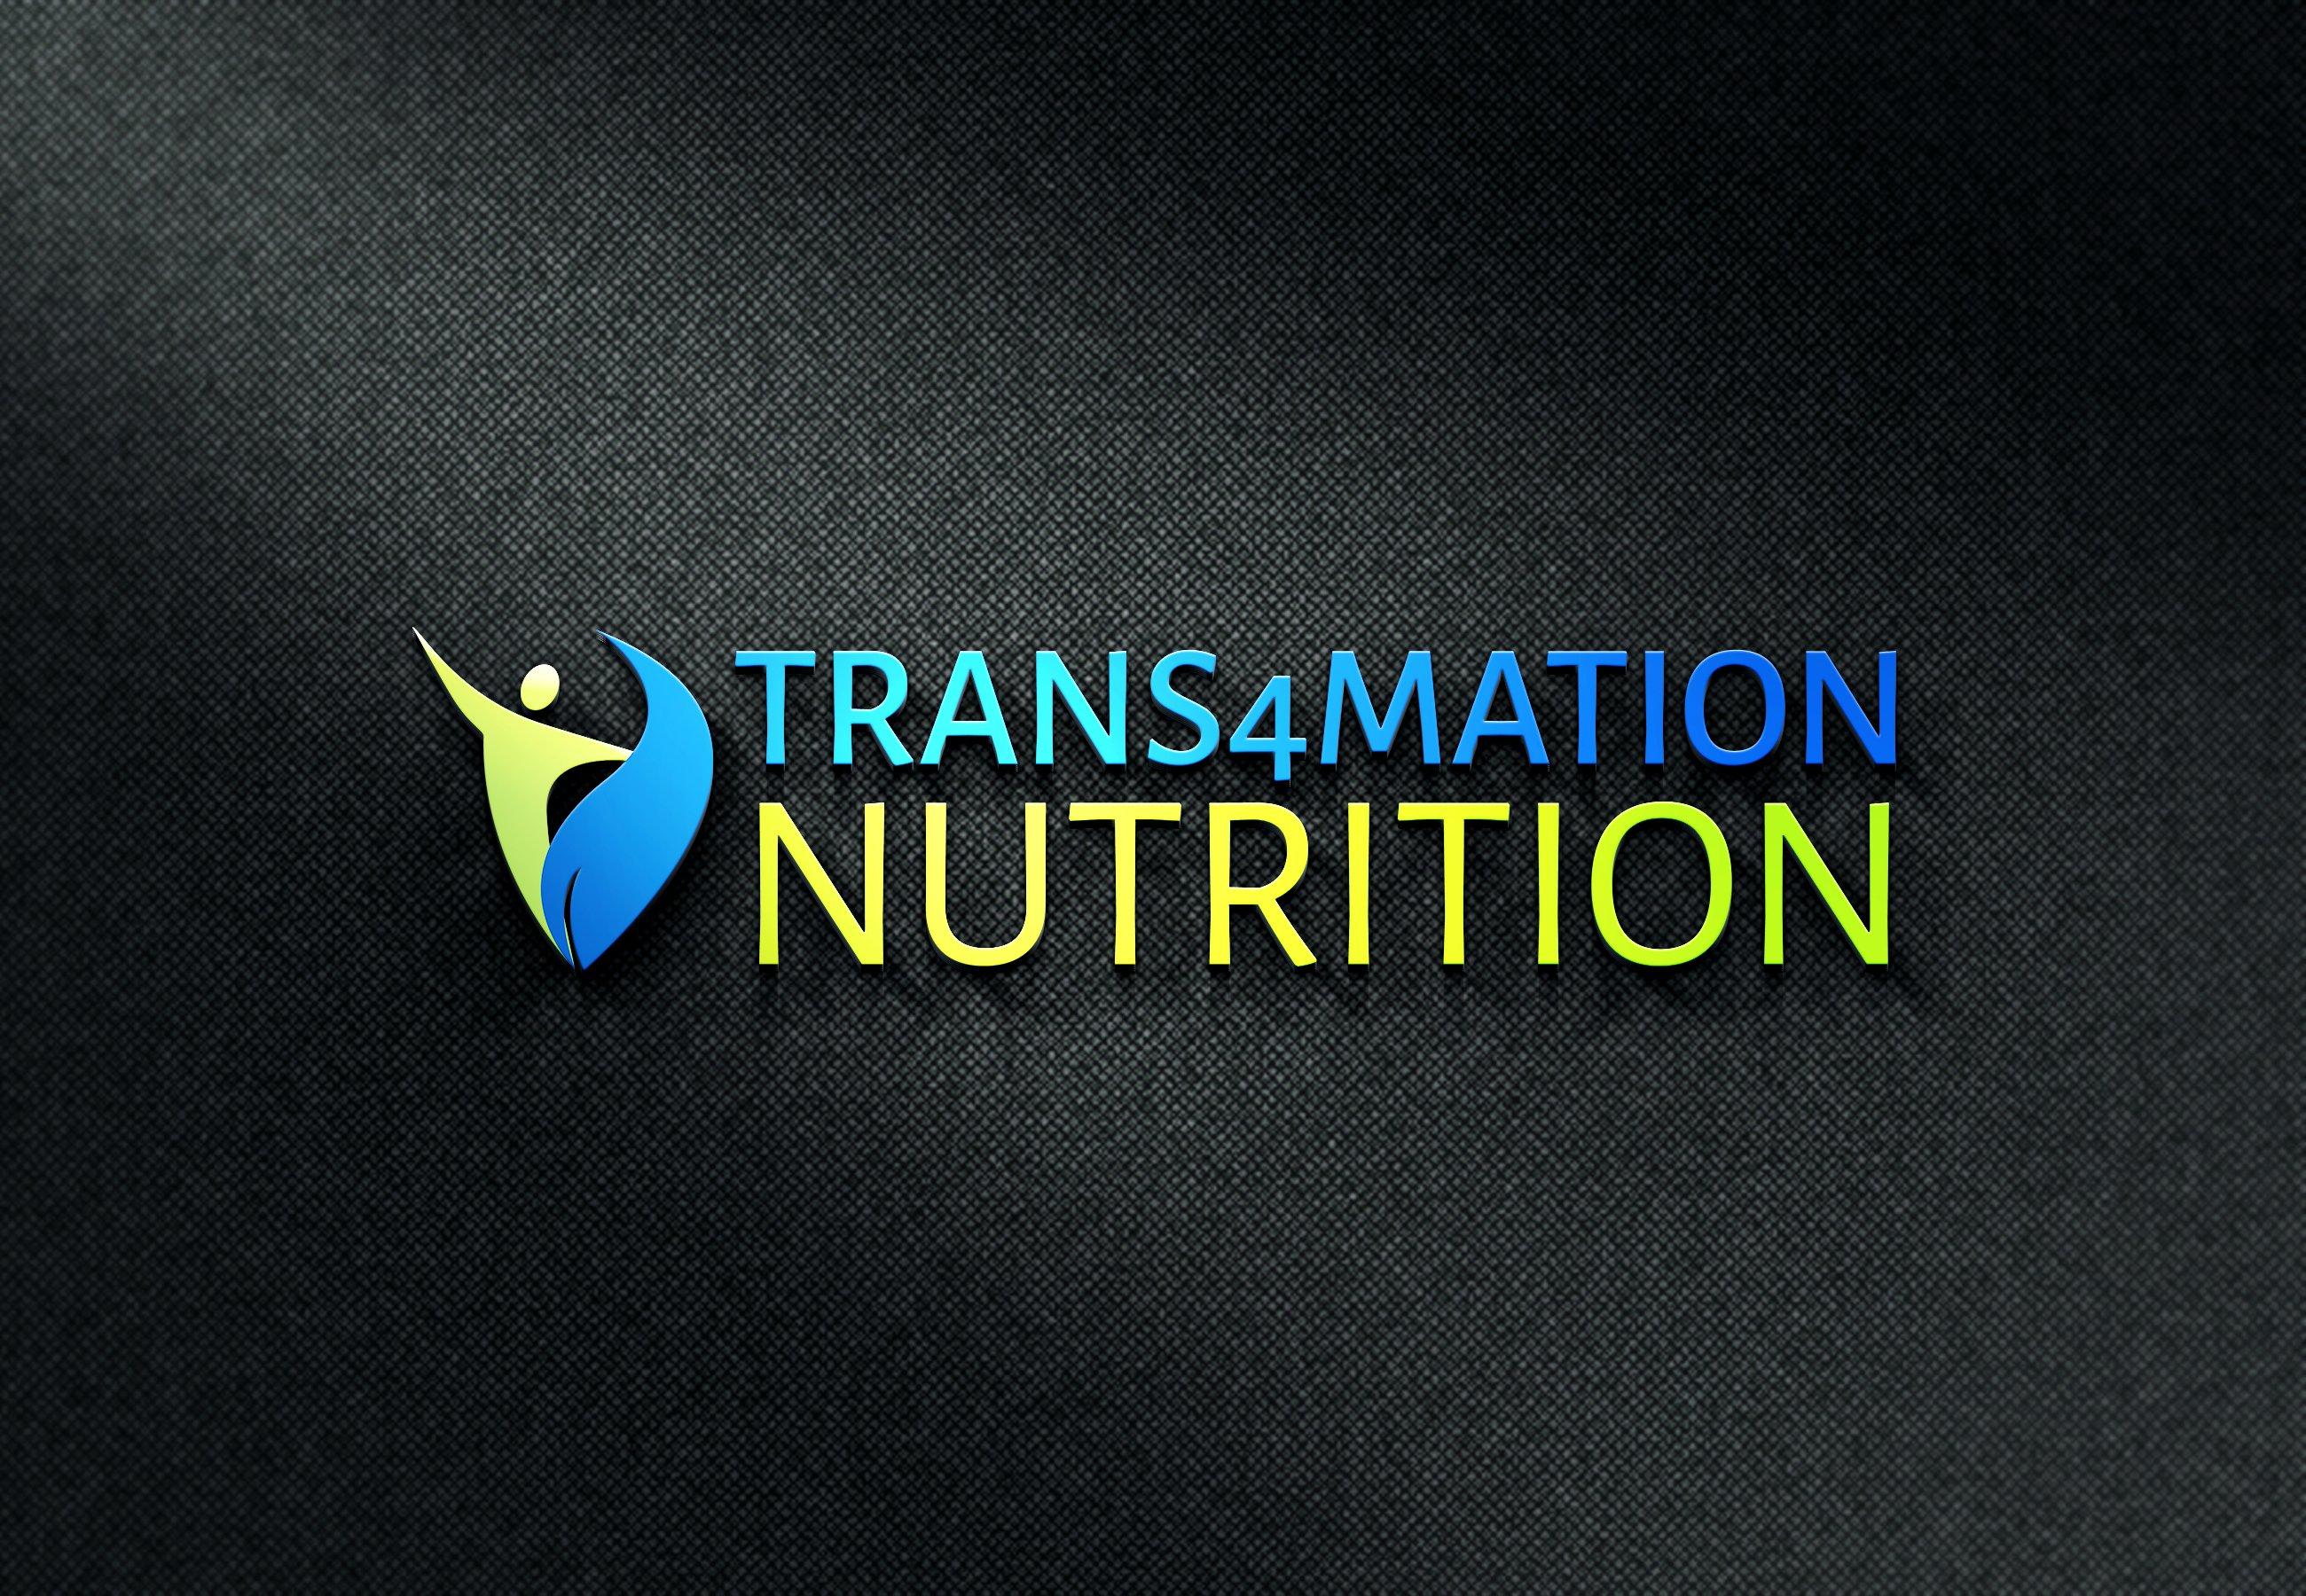 Trans4mation-logo-design